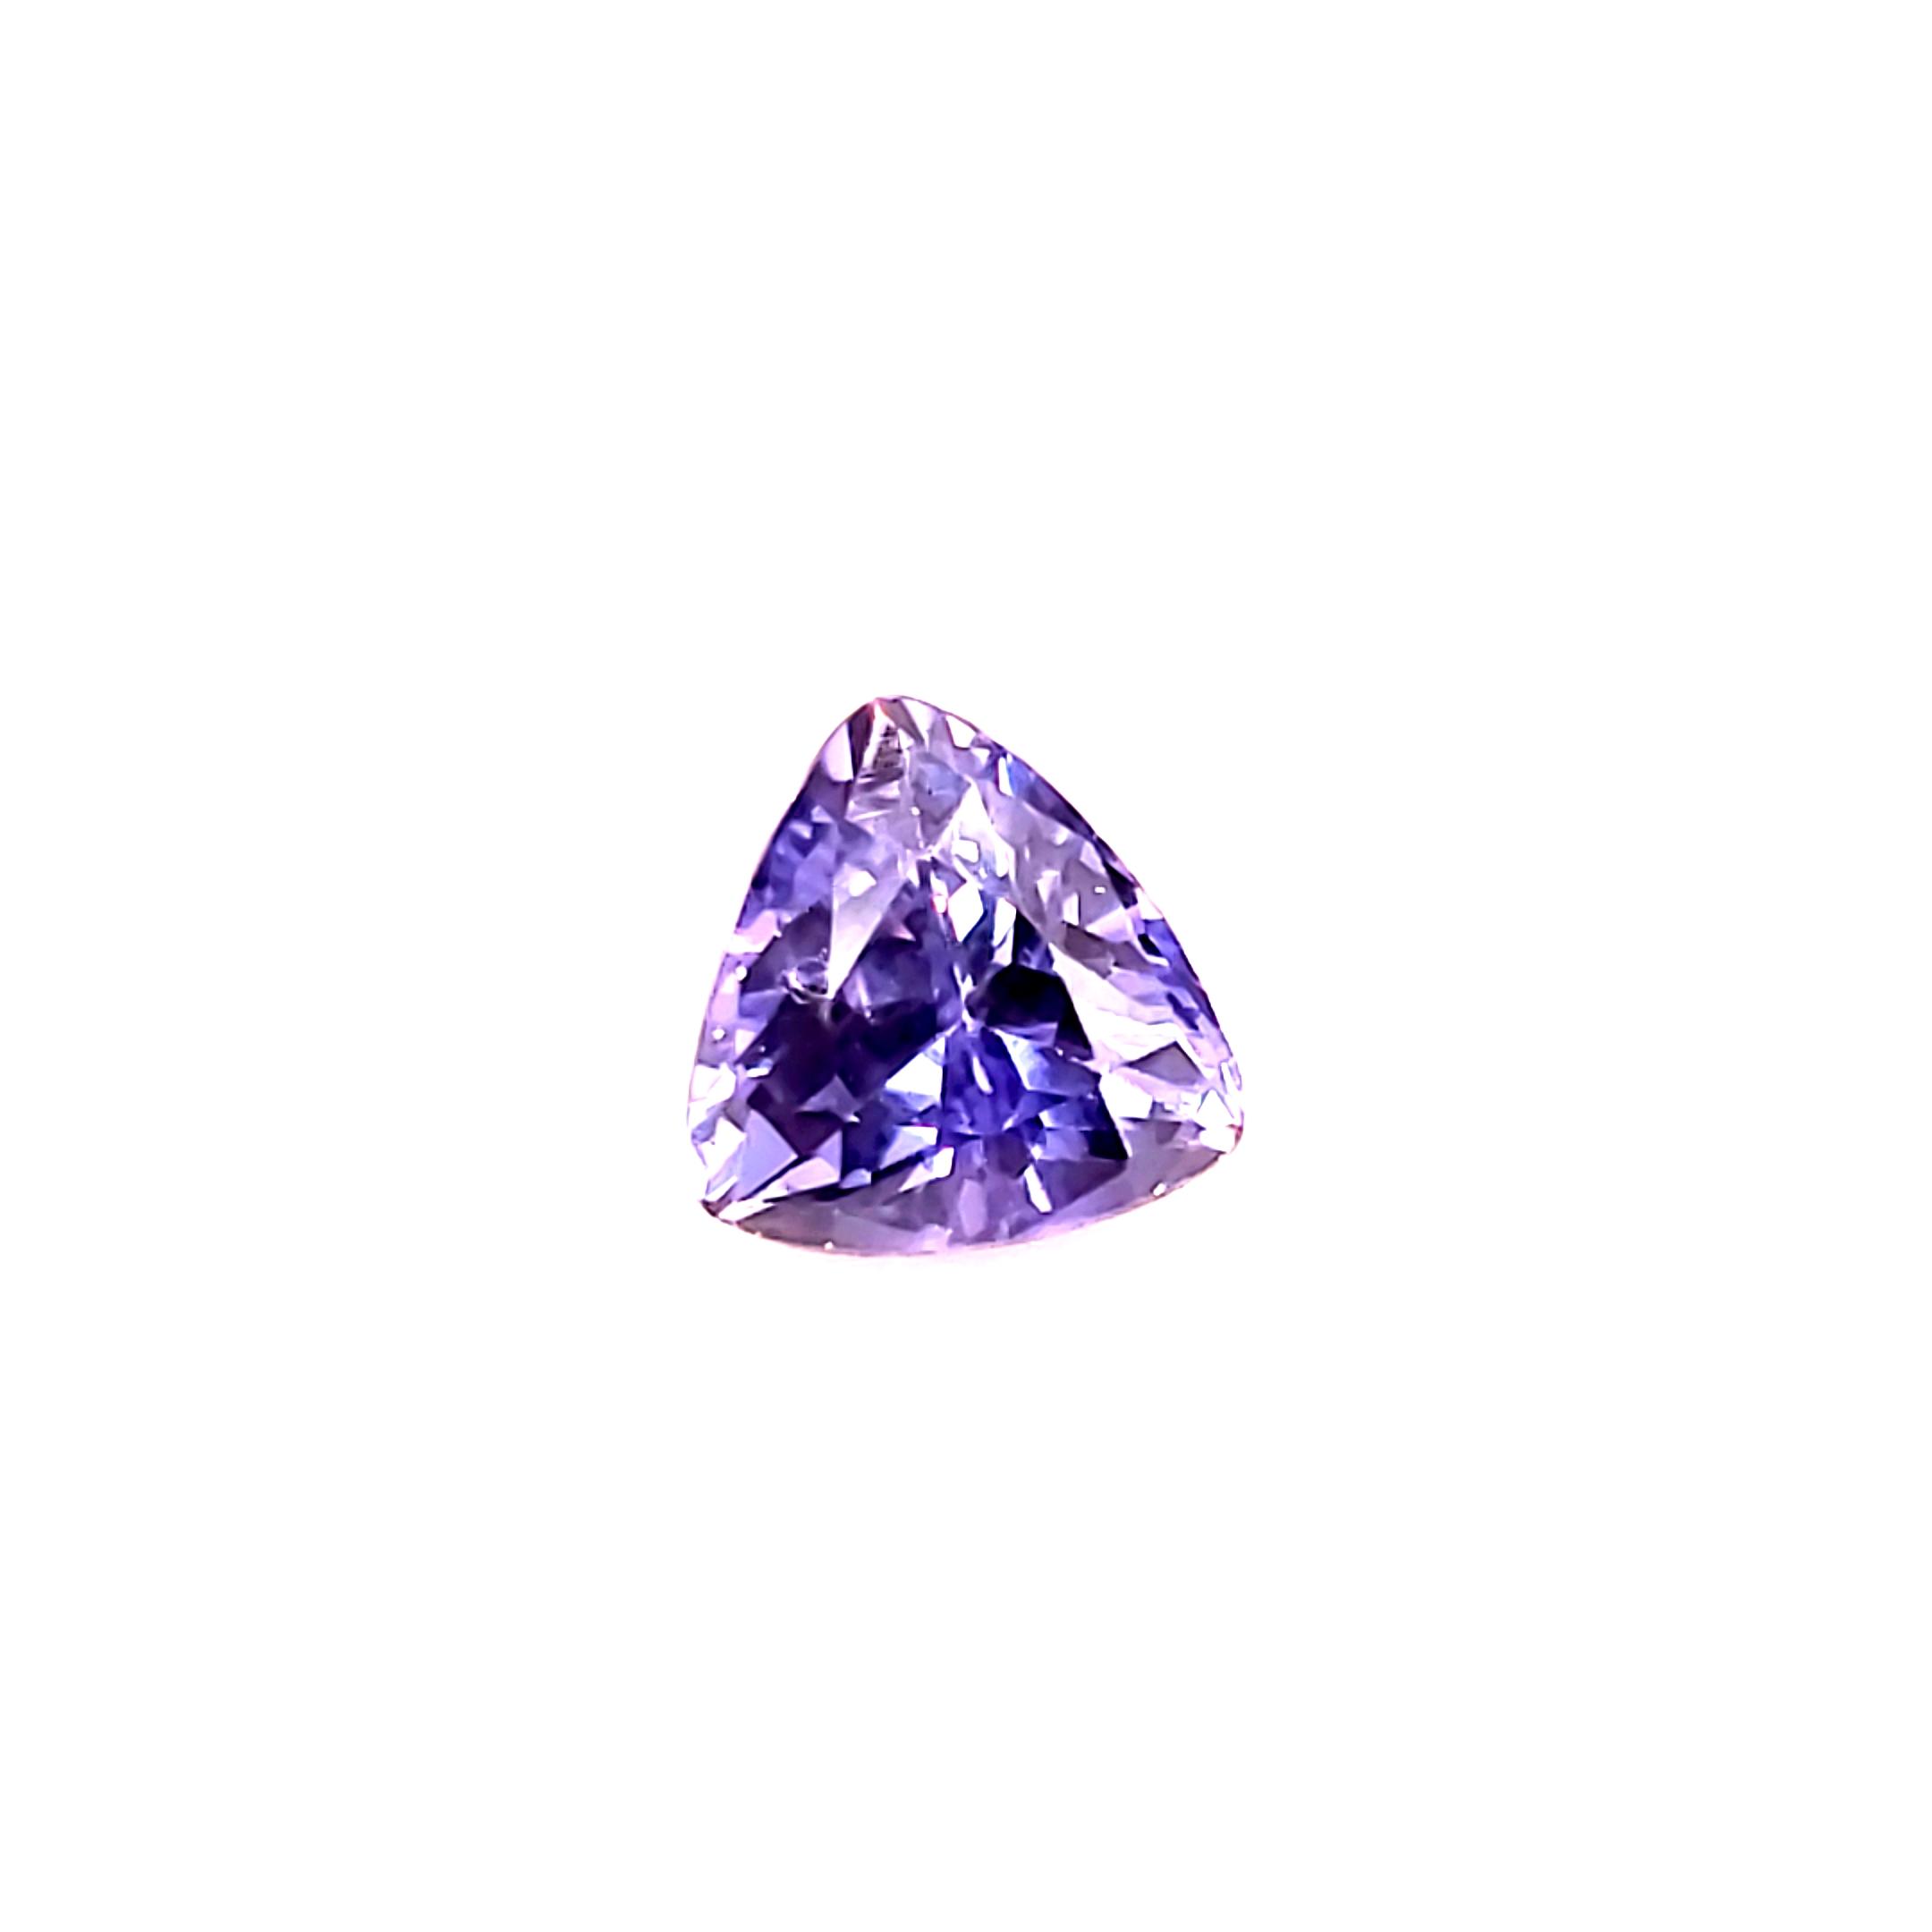 1.08 ct. Lavender Bluish Purple Sapphire